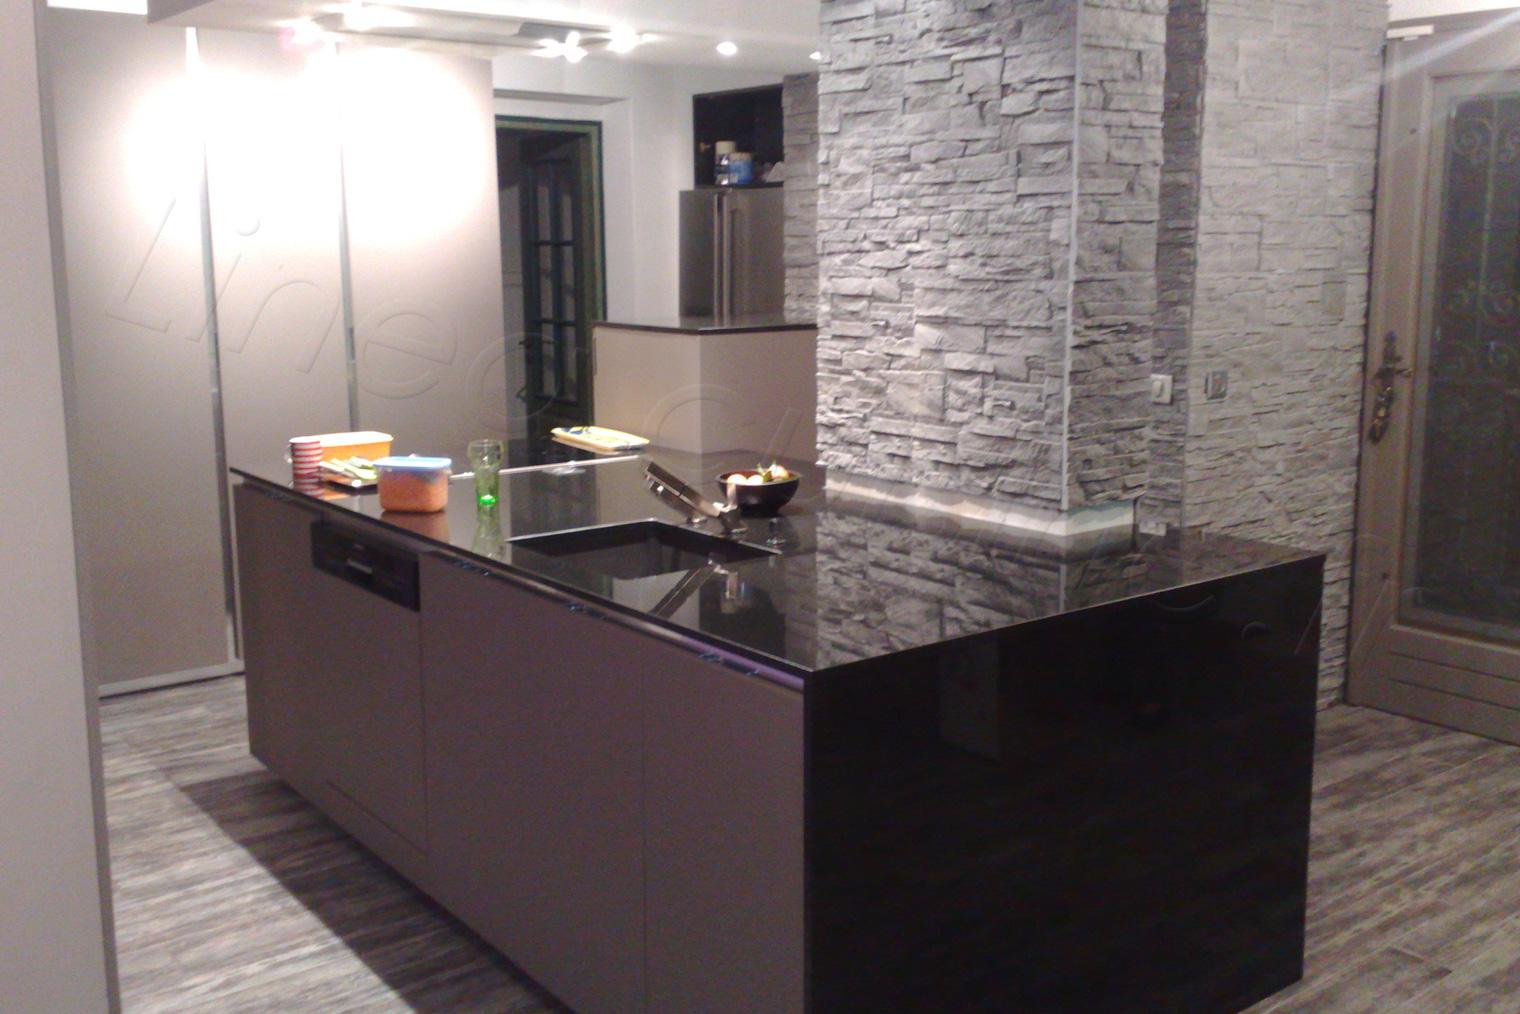 cuisine moderne avec ilot deco maison moderne. Black Bedroom Furniture Sets. Home Design Ideas